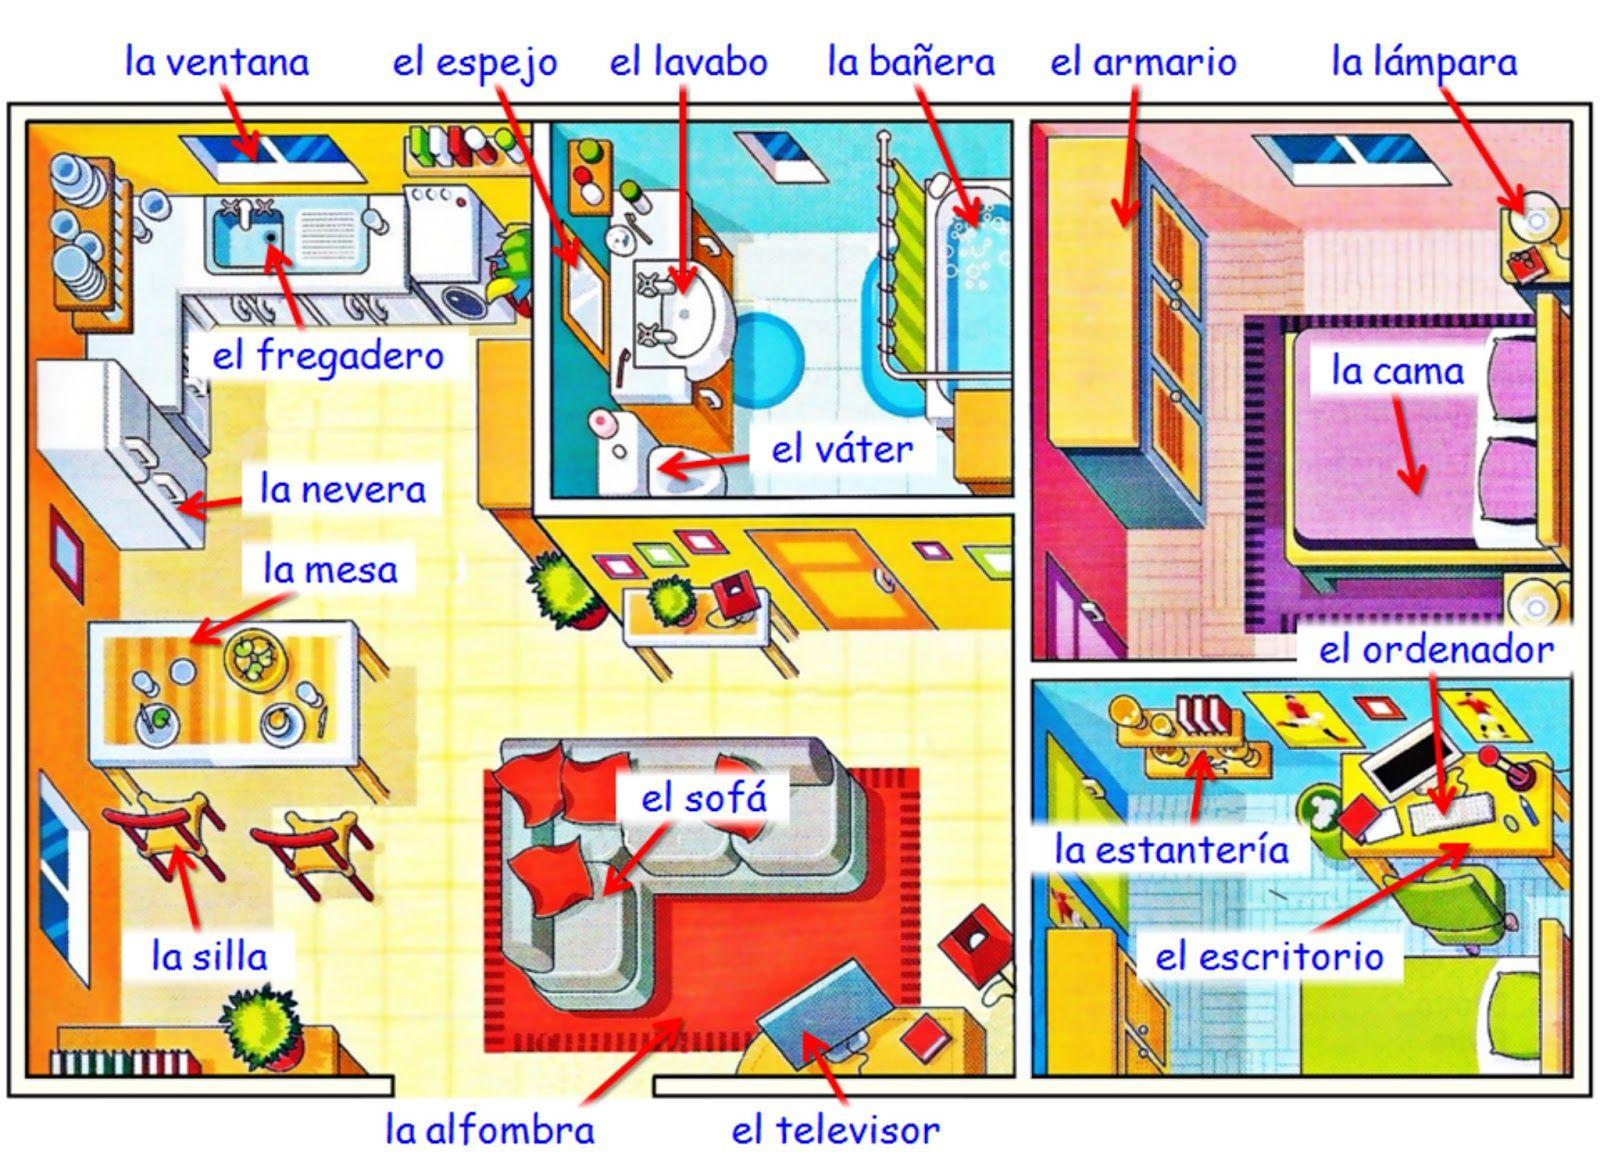 Daily Everyday Activities Speaking Course Online Verbos Reflexivos Clases De Chino Clase De Espanol